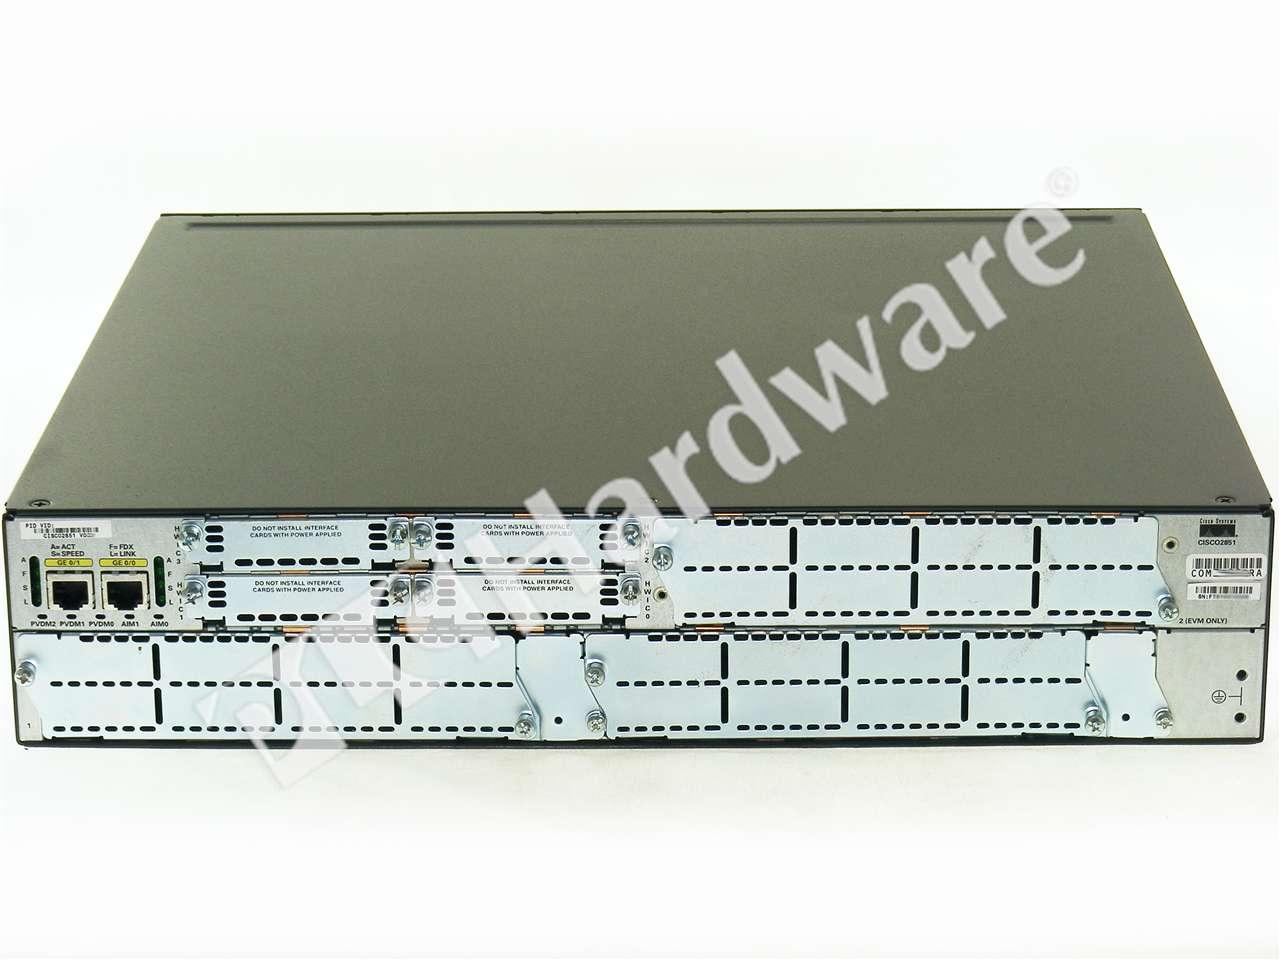 Cisco 2800 Series Hardware Installation - Overview of Cisco 2800 ...